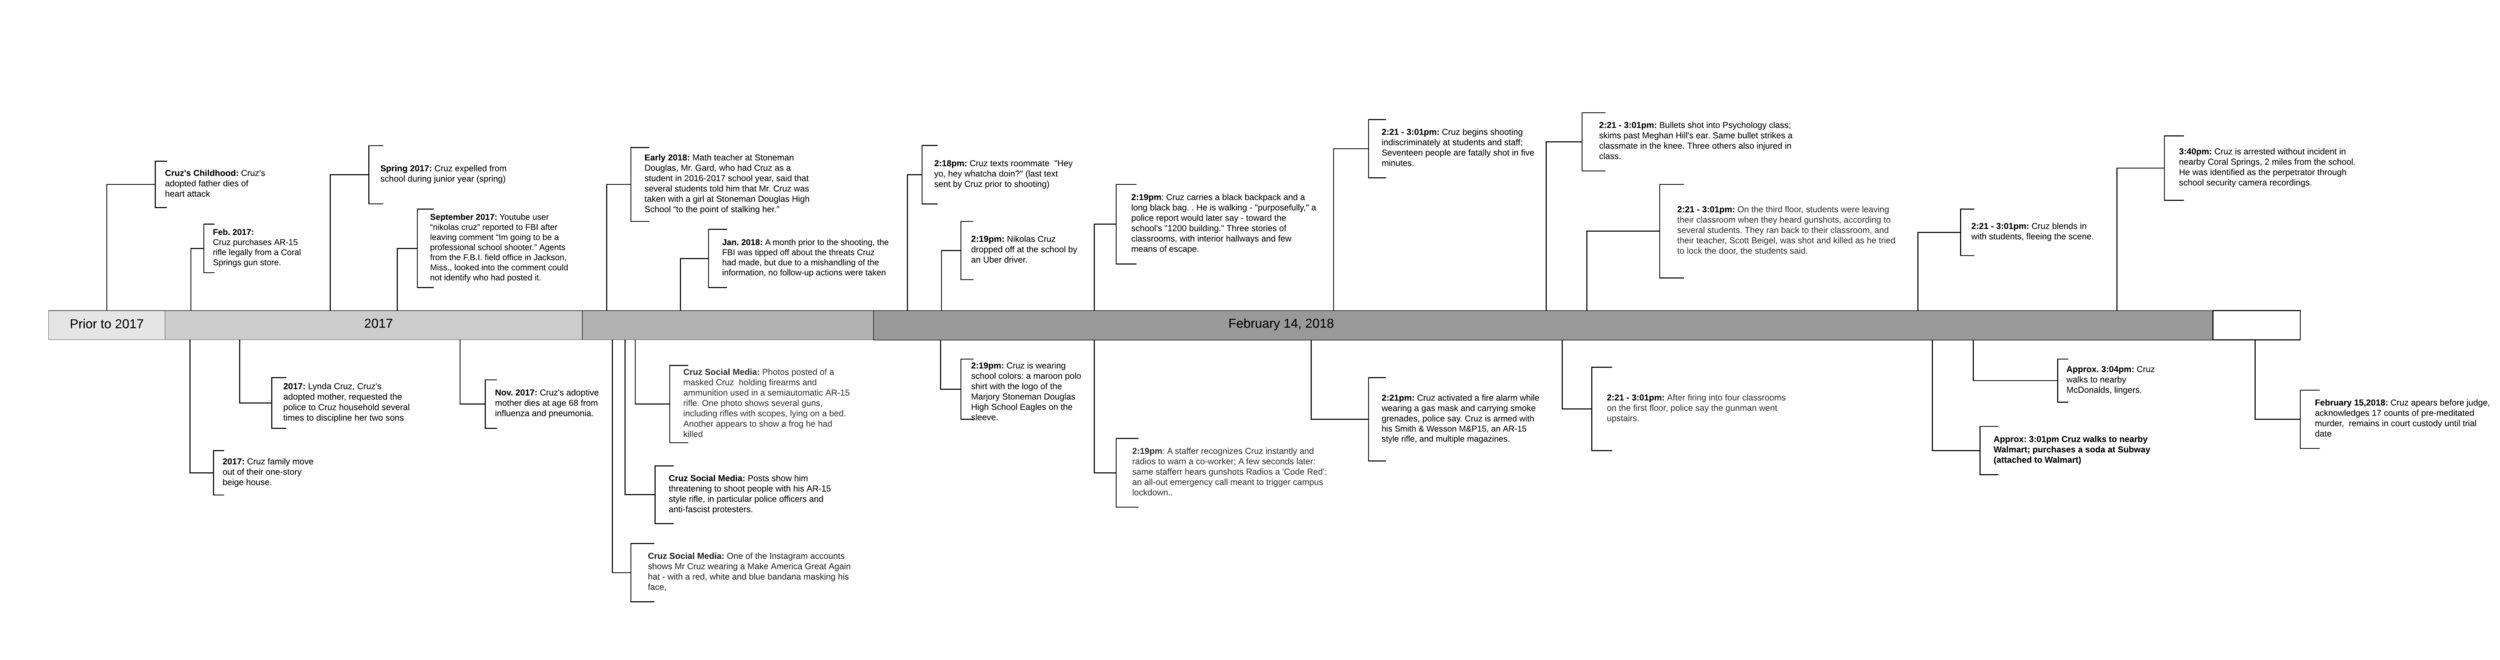 Stoneman Douglas Shooting Timeline , 2019, Johns Hopkins University.  Click image to enlarge.